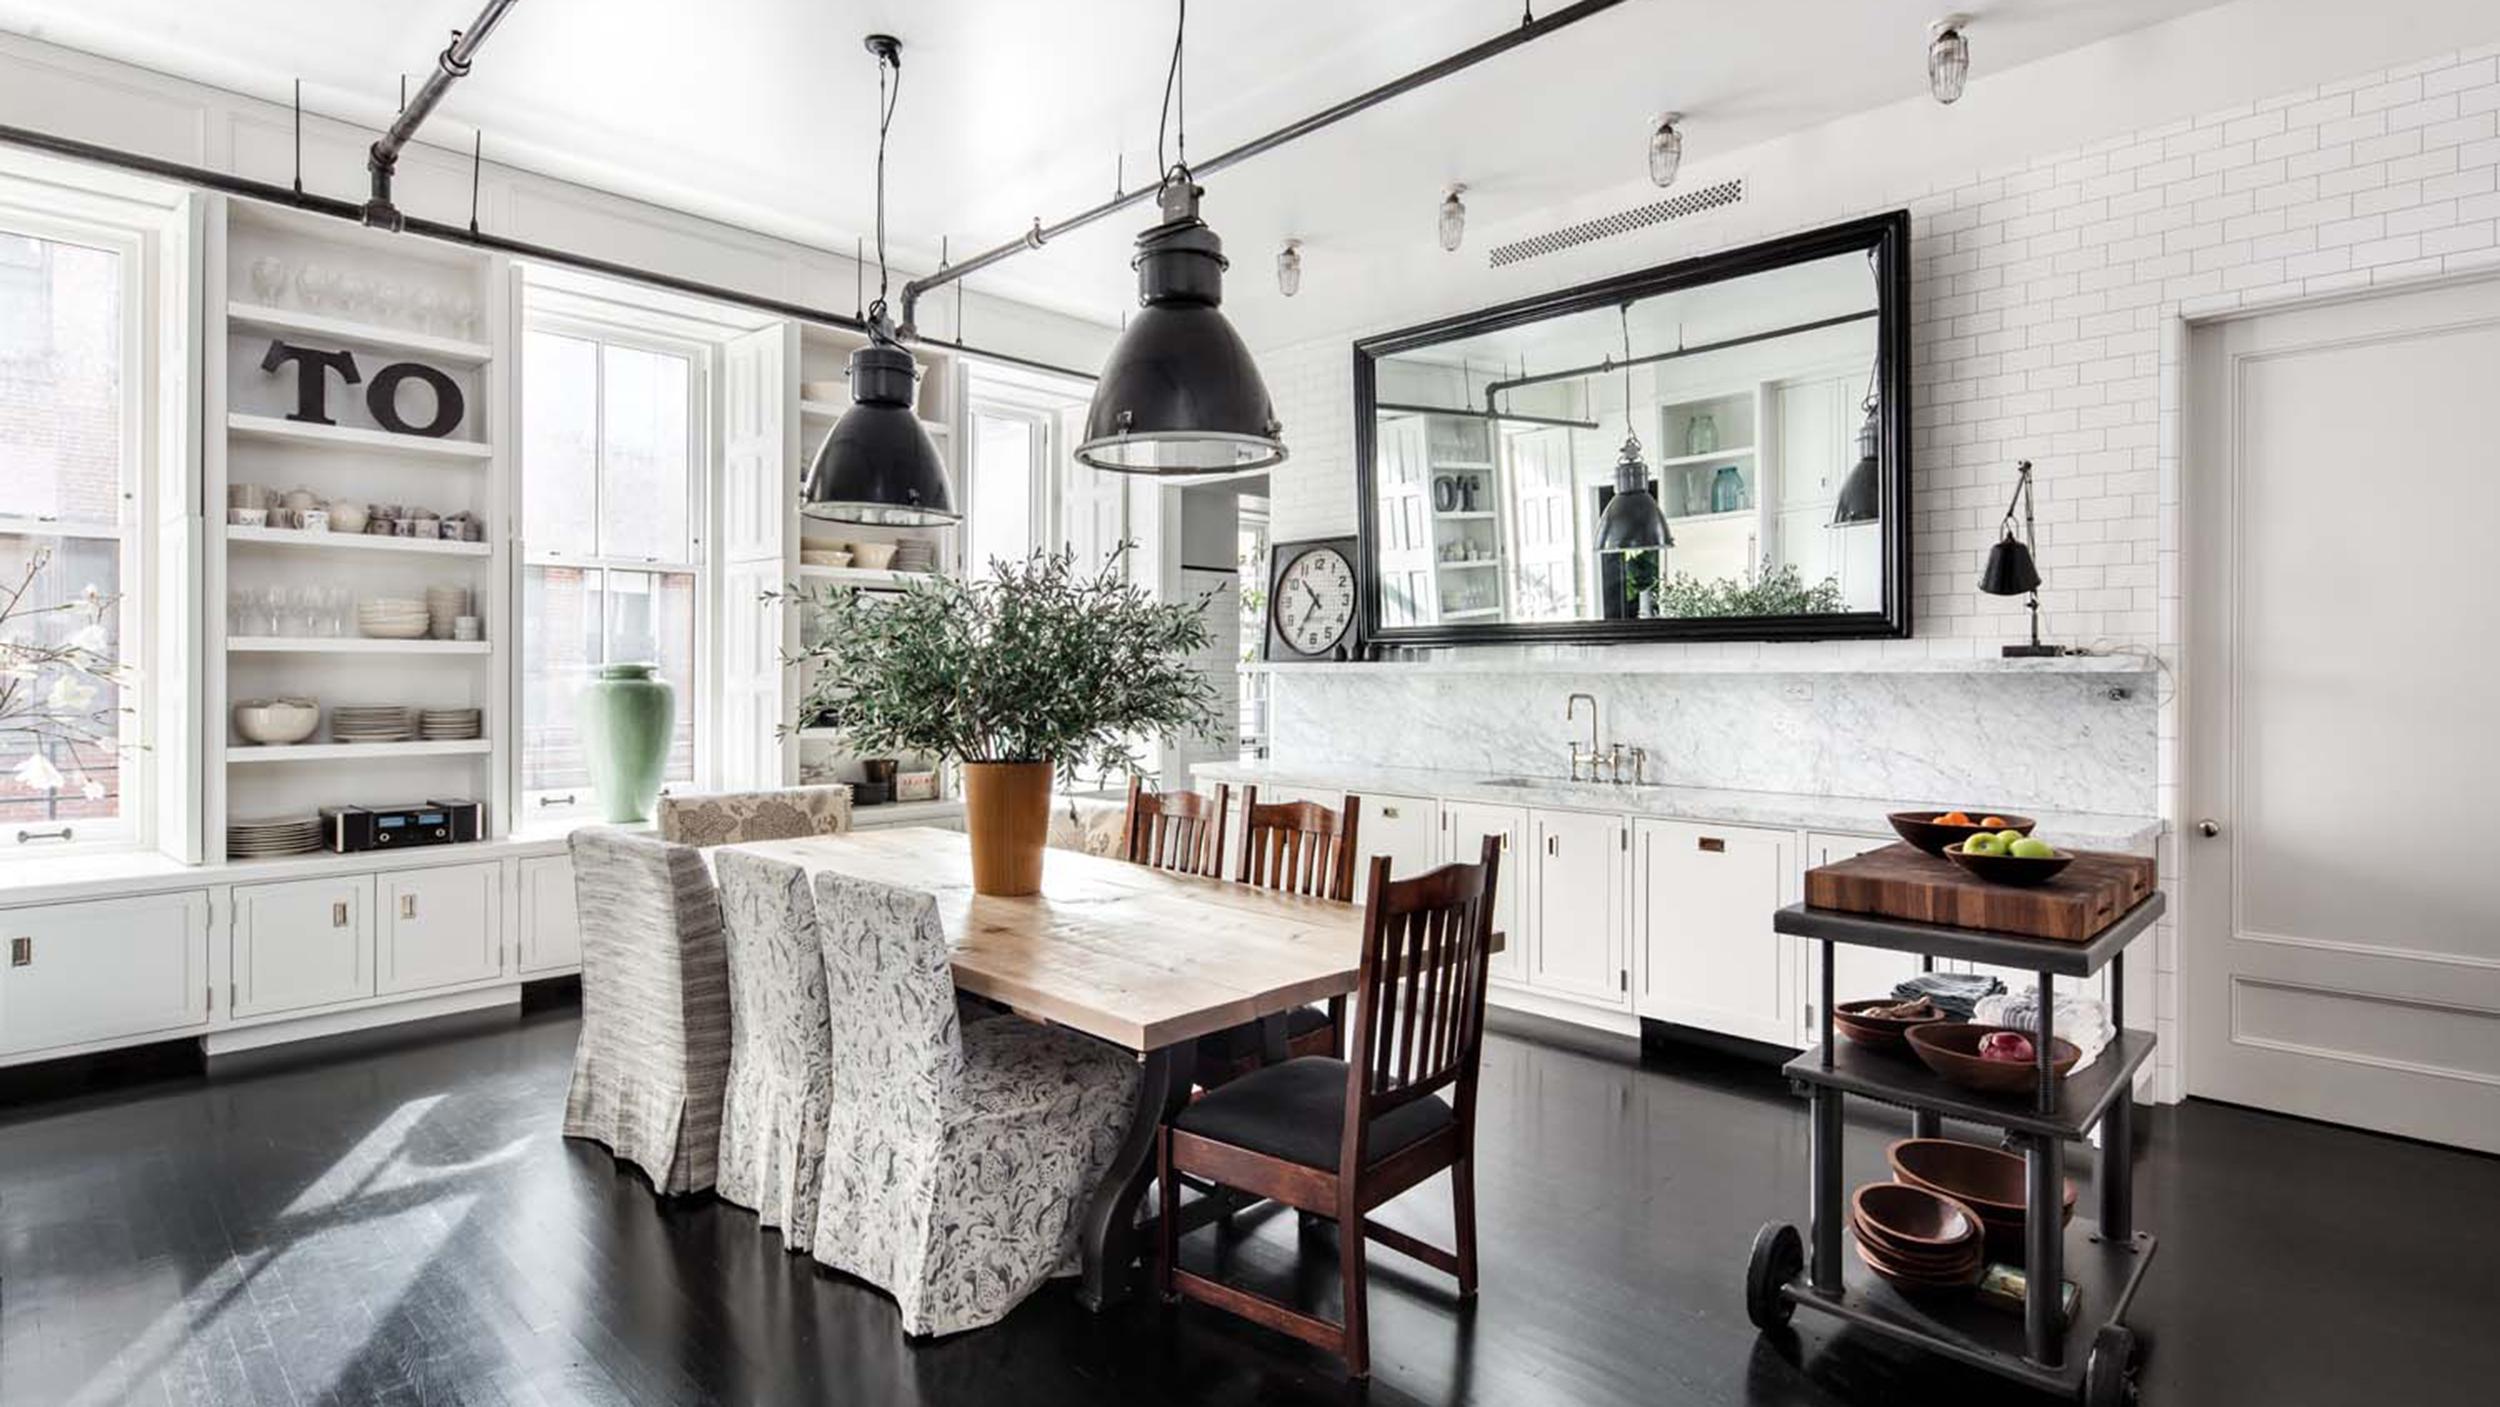 Meg Ryan lists her stunning NYC home  see inside  TODAYcom